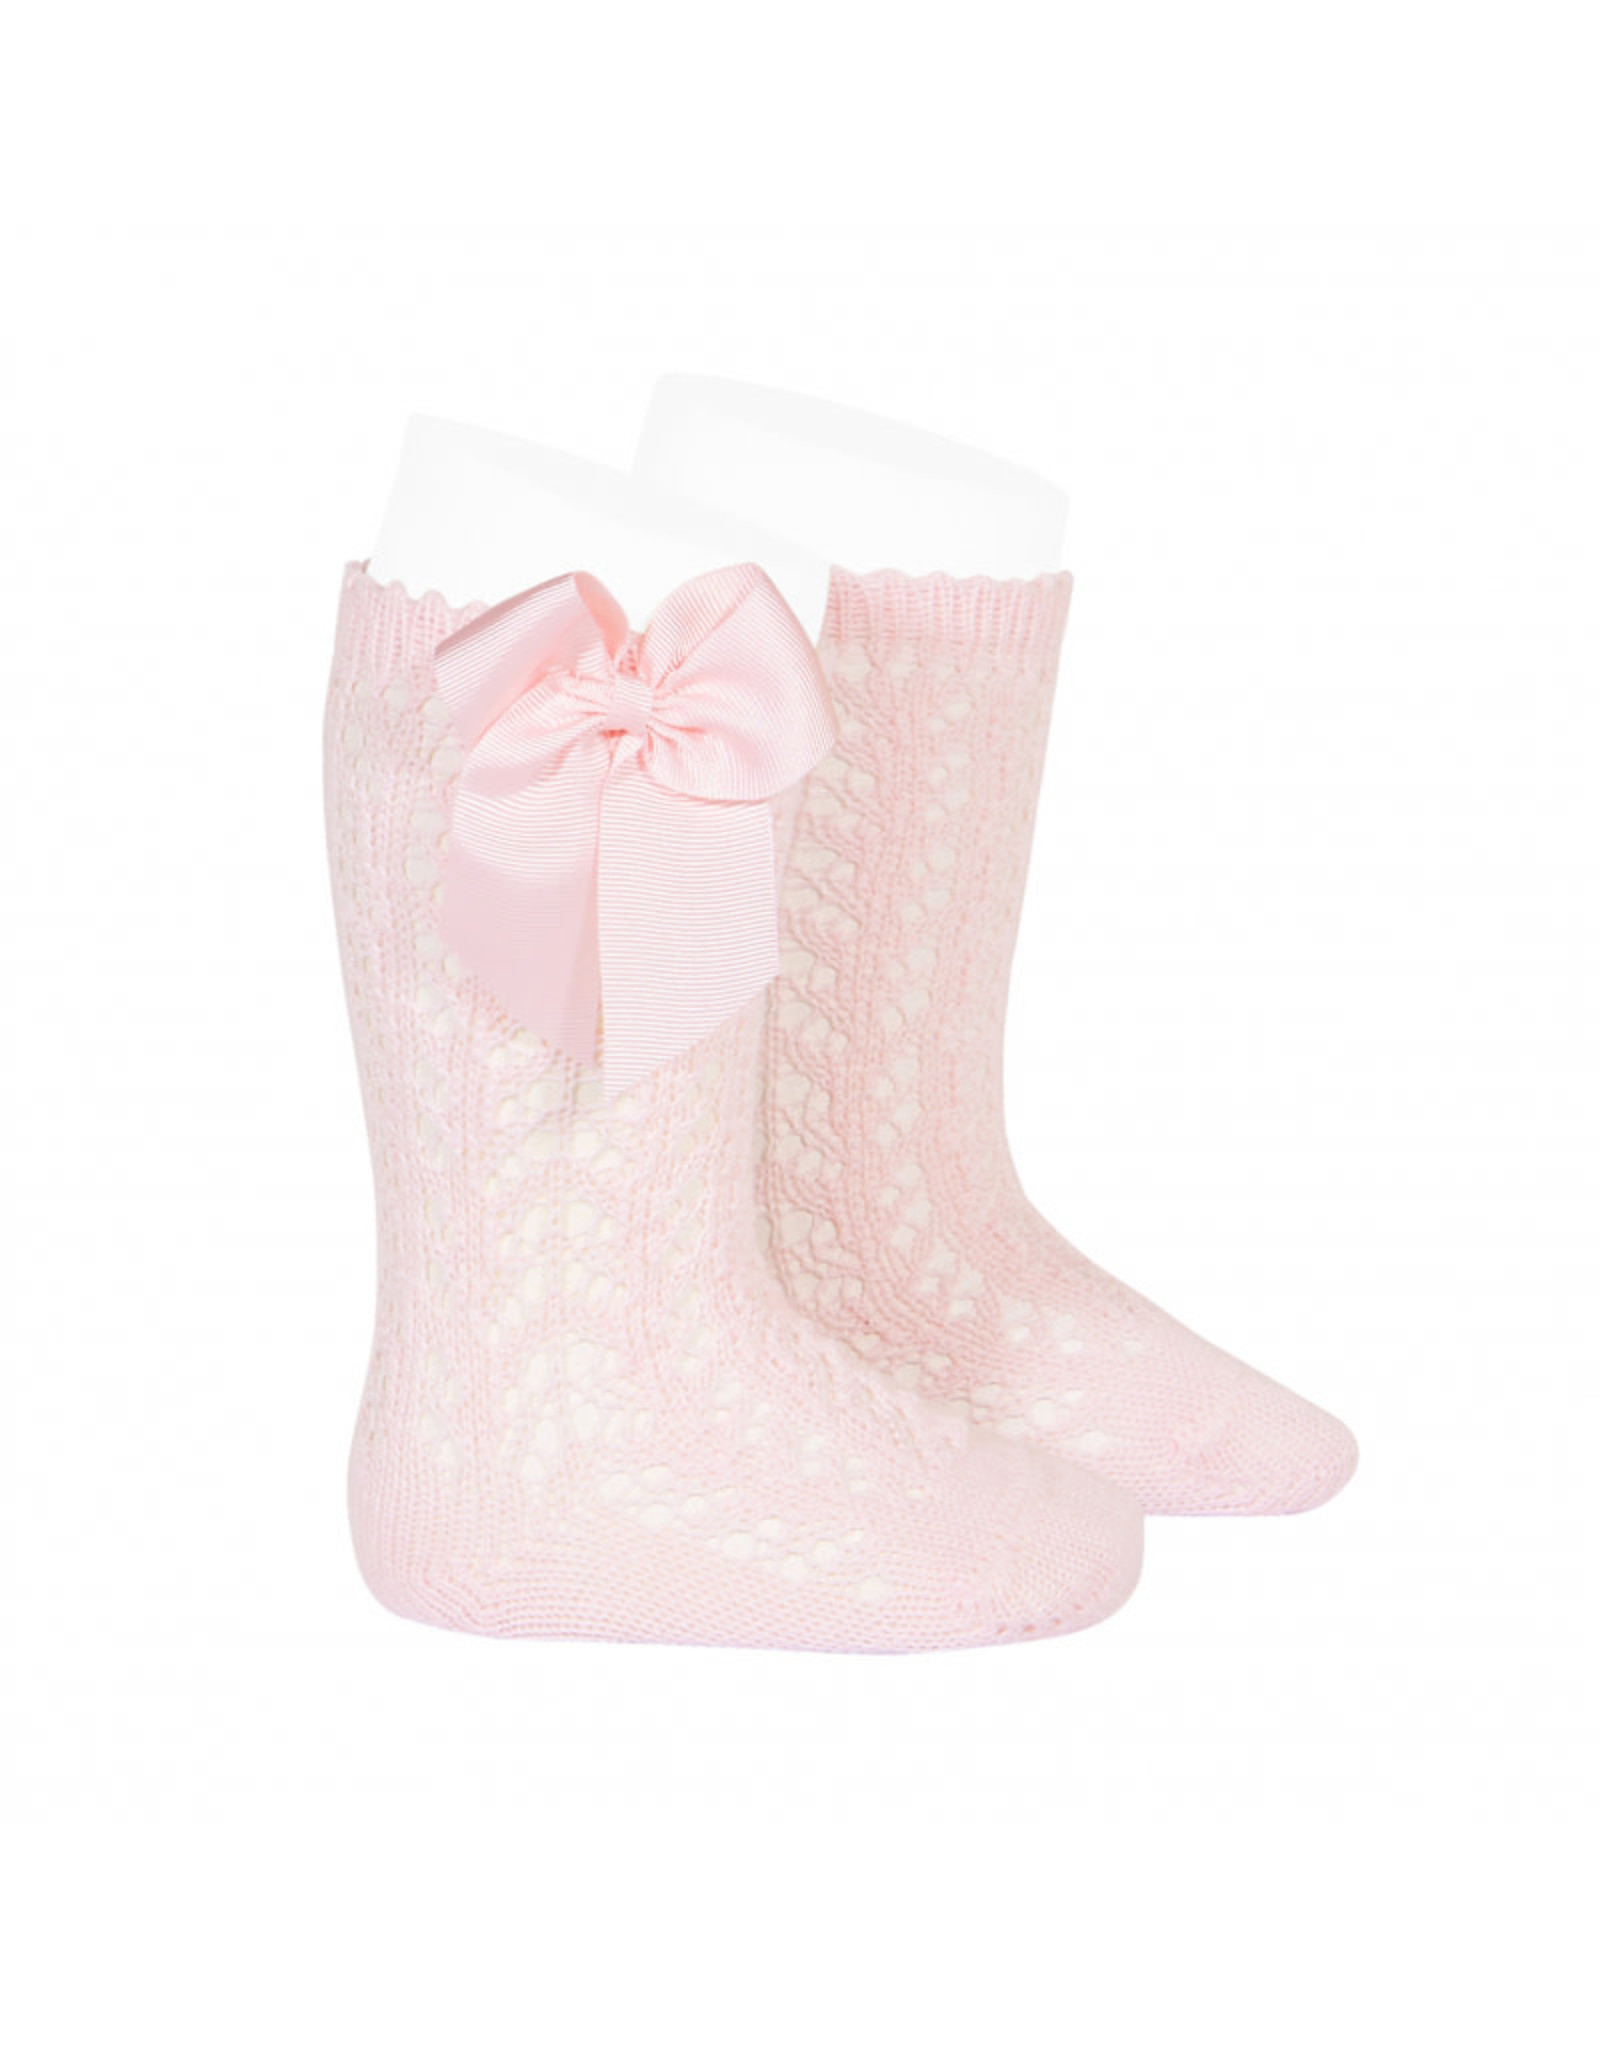 CONDOR Pink Openwork Knee Socks with Bow